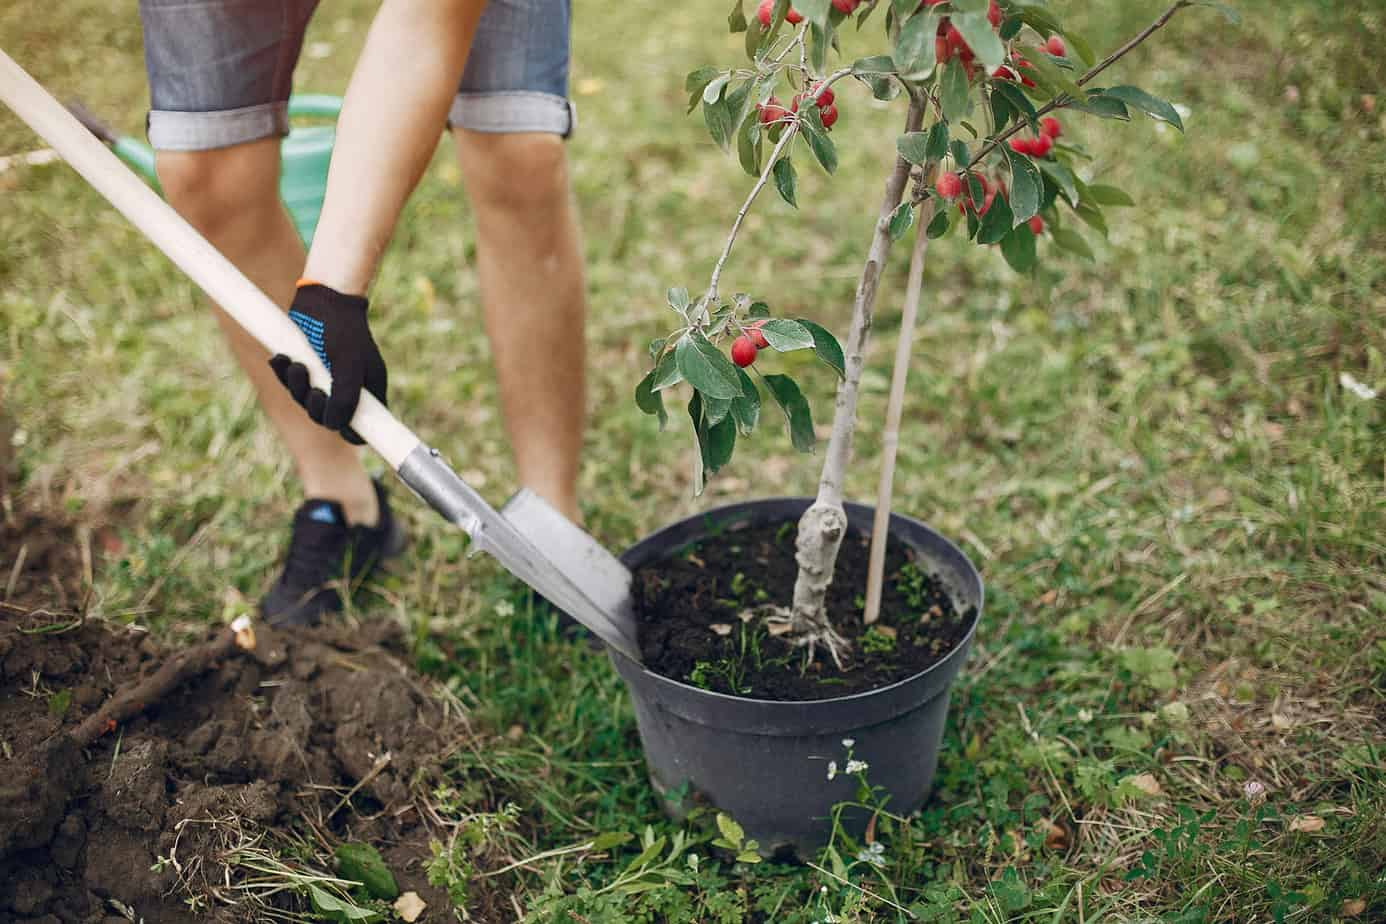 Planting a tree on a yard